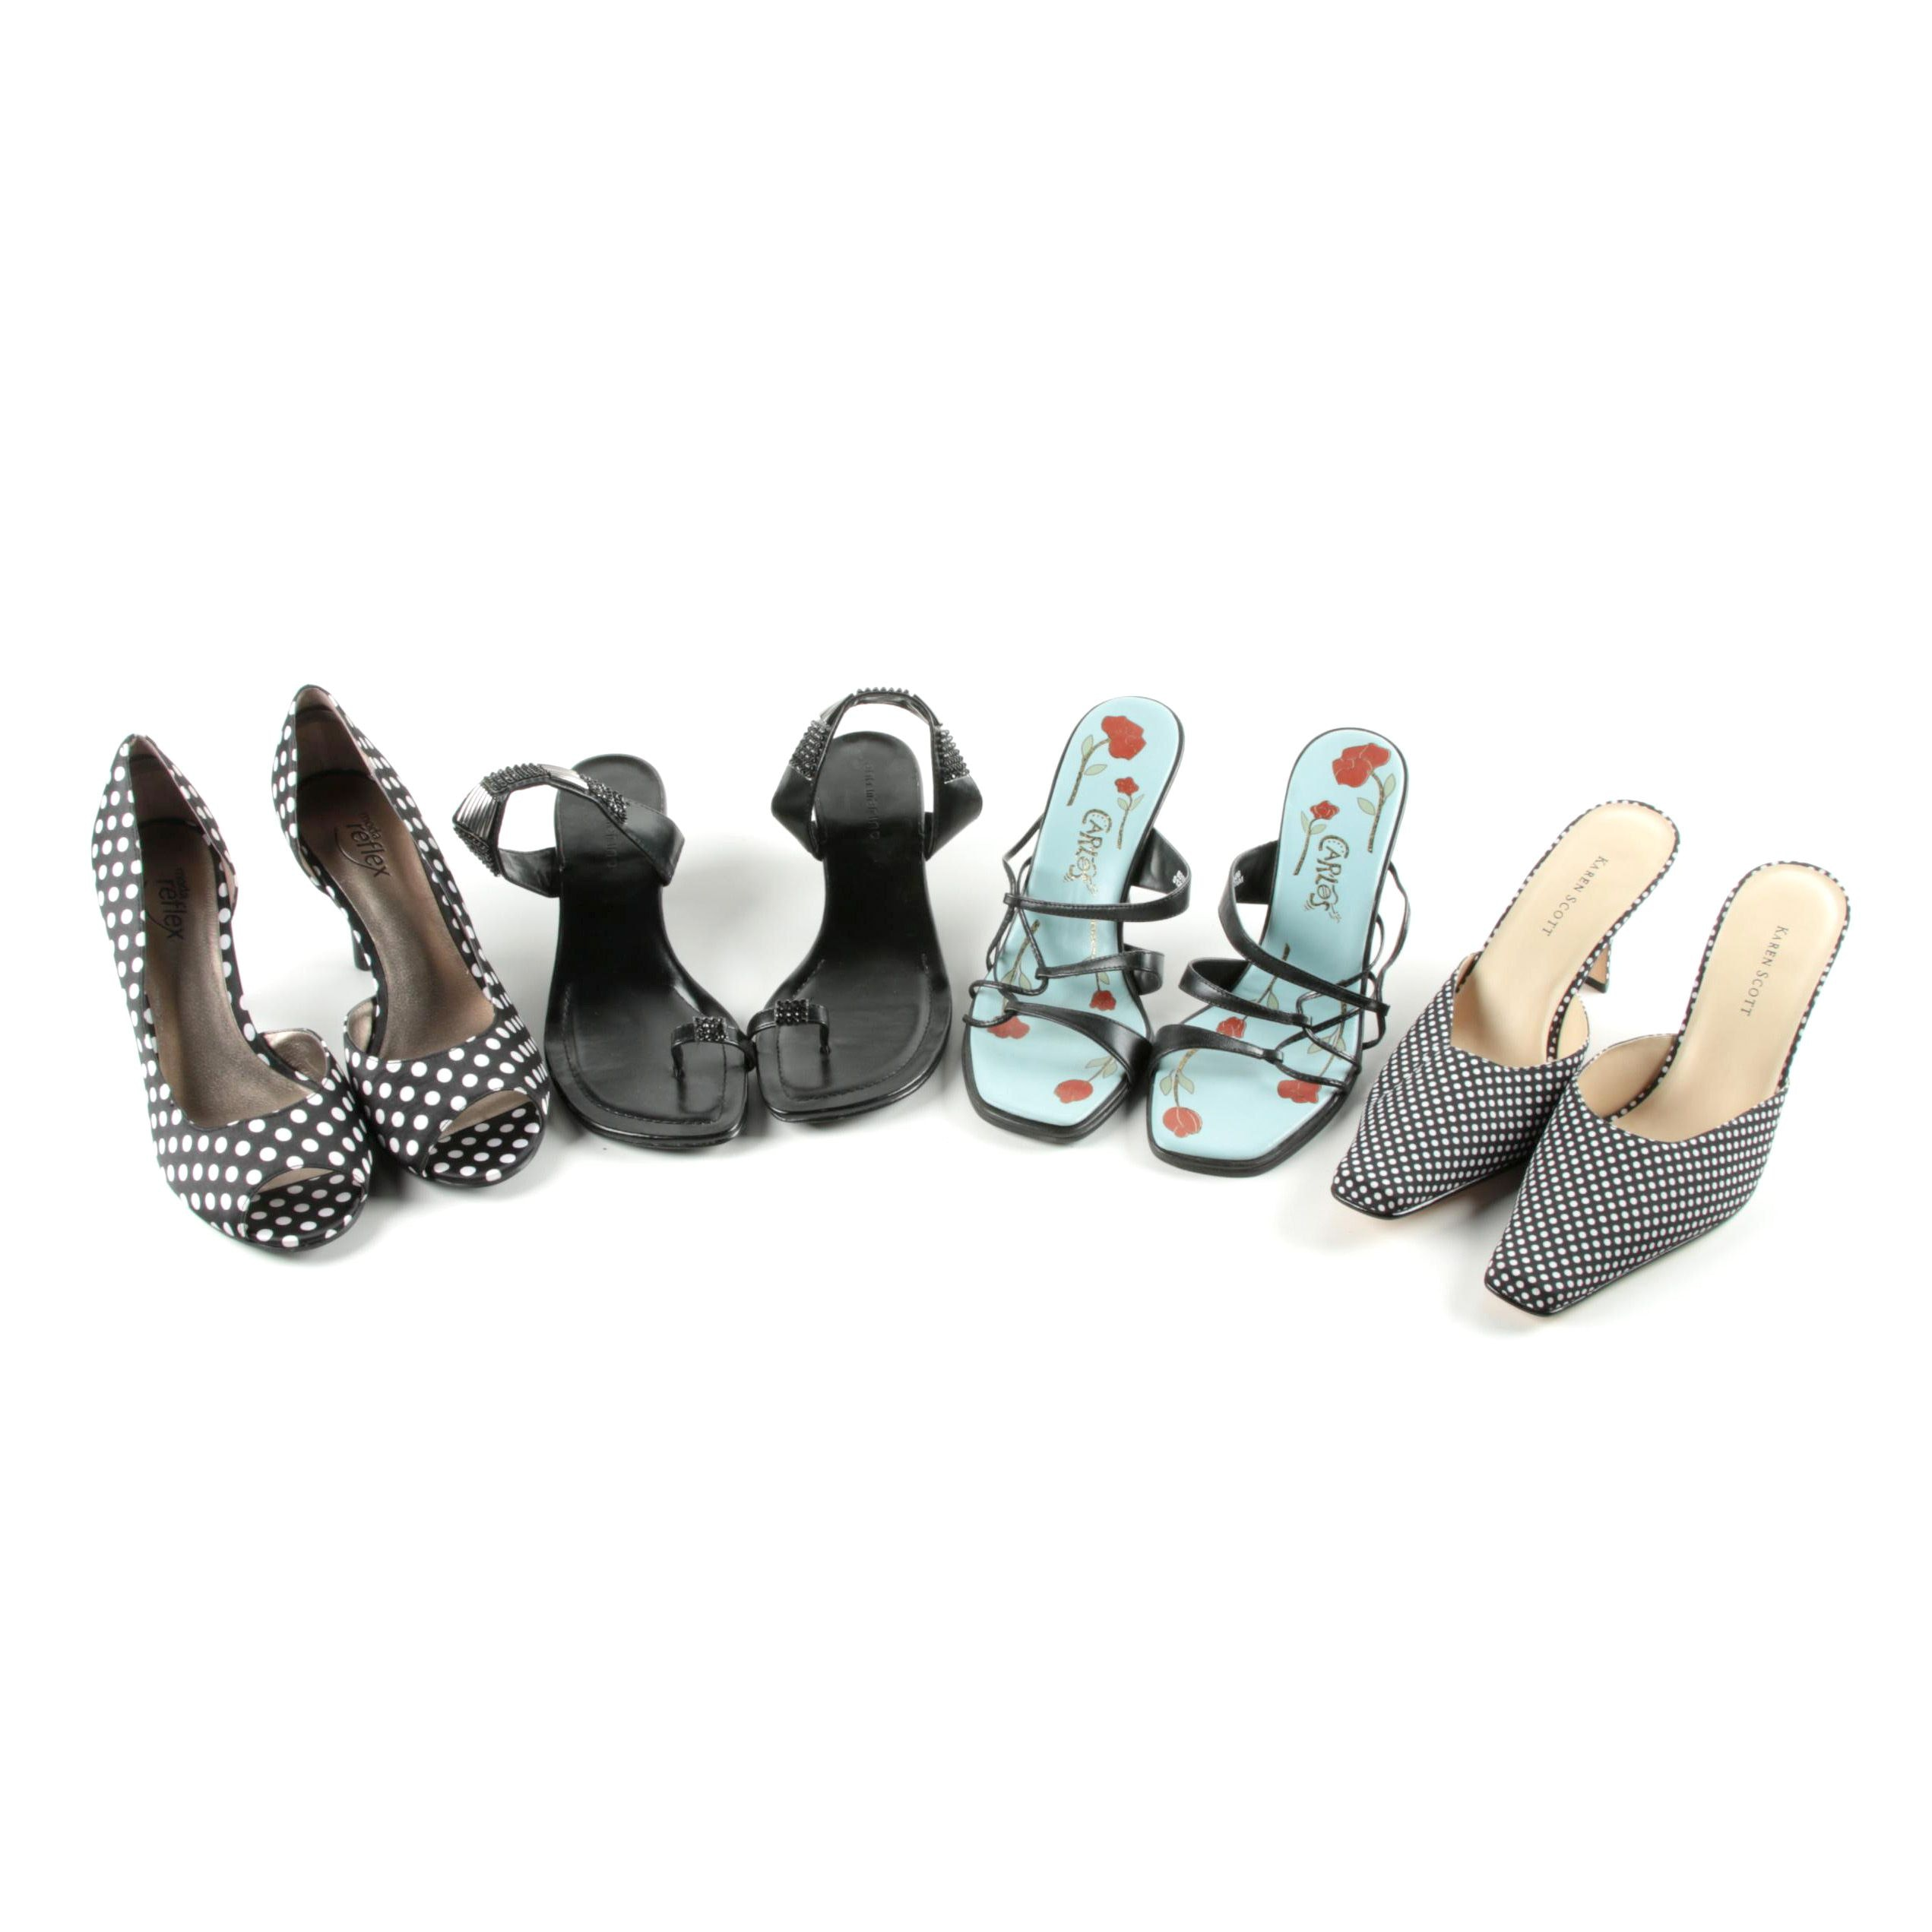 Low Heel Sandals, Slides and Pumps Including Karen Scott